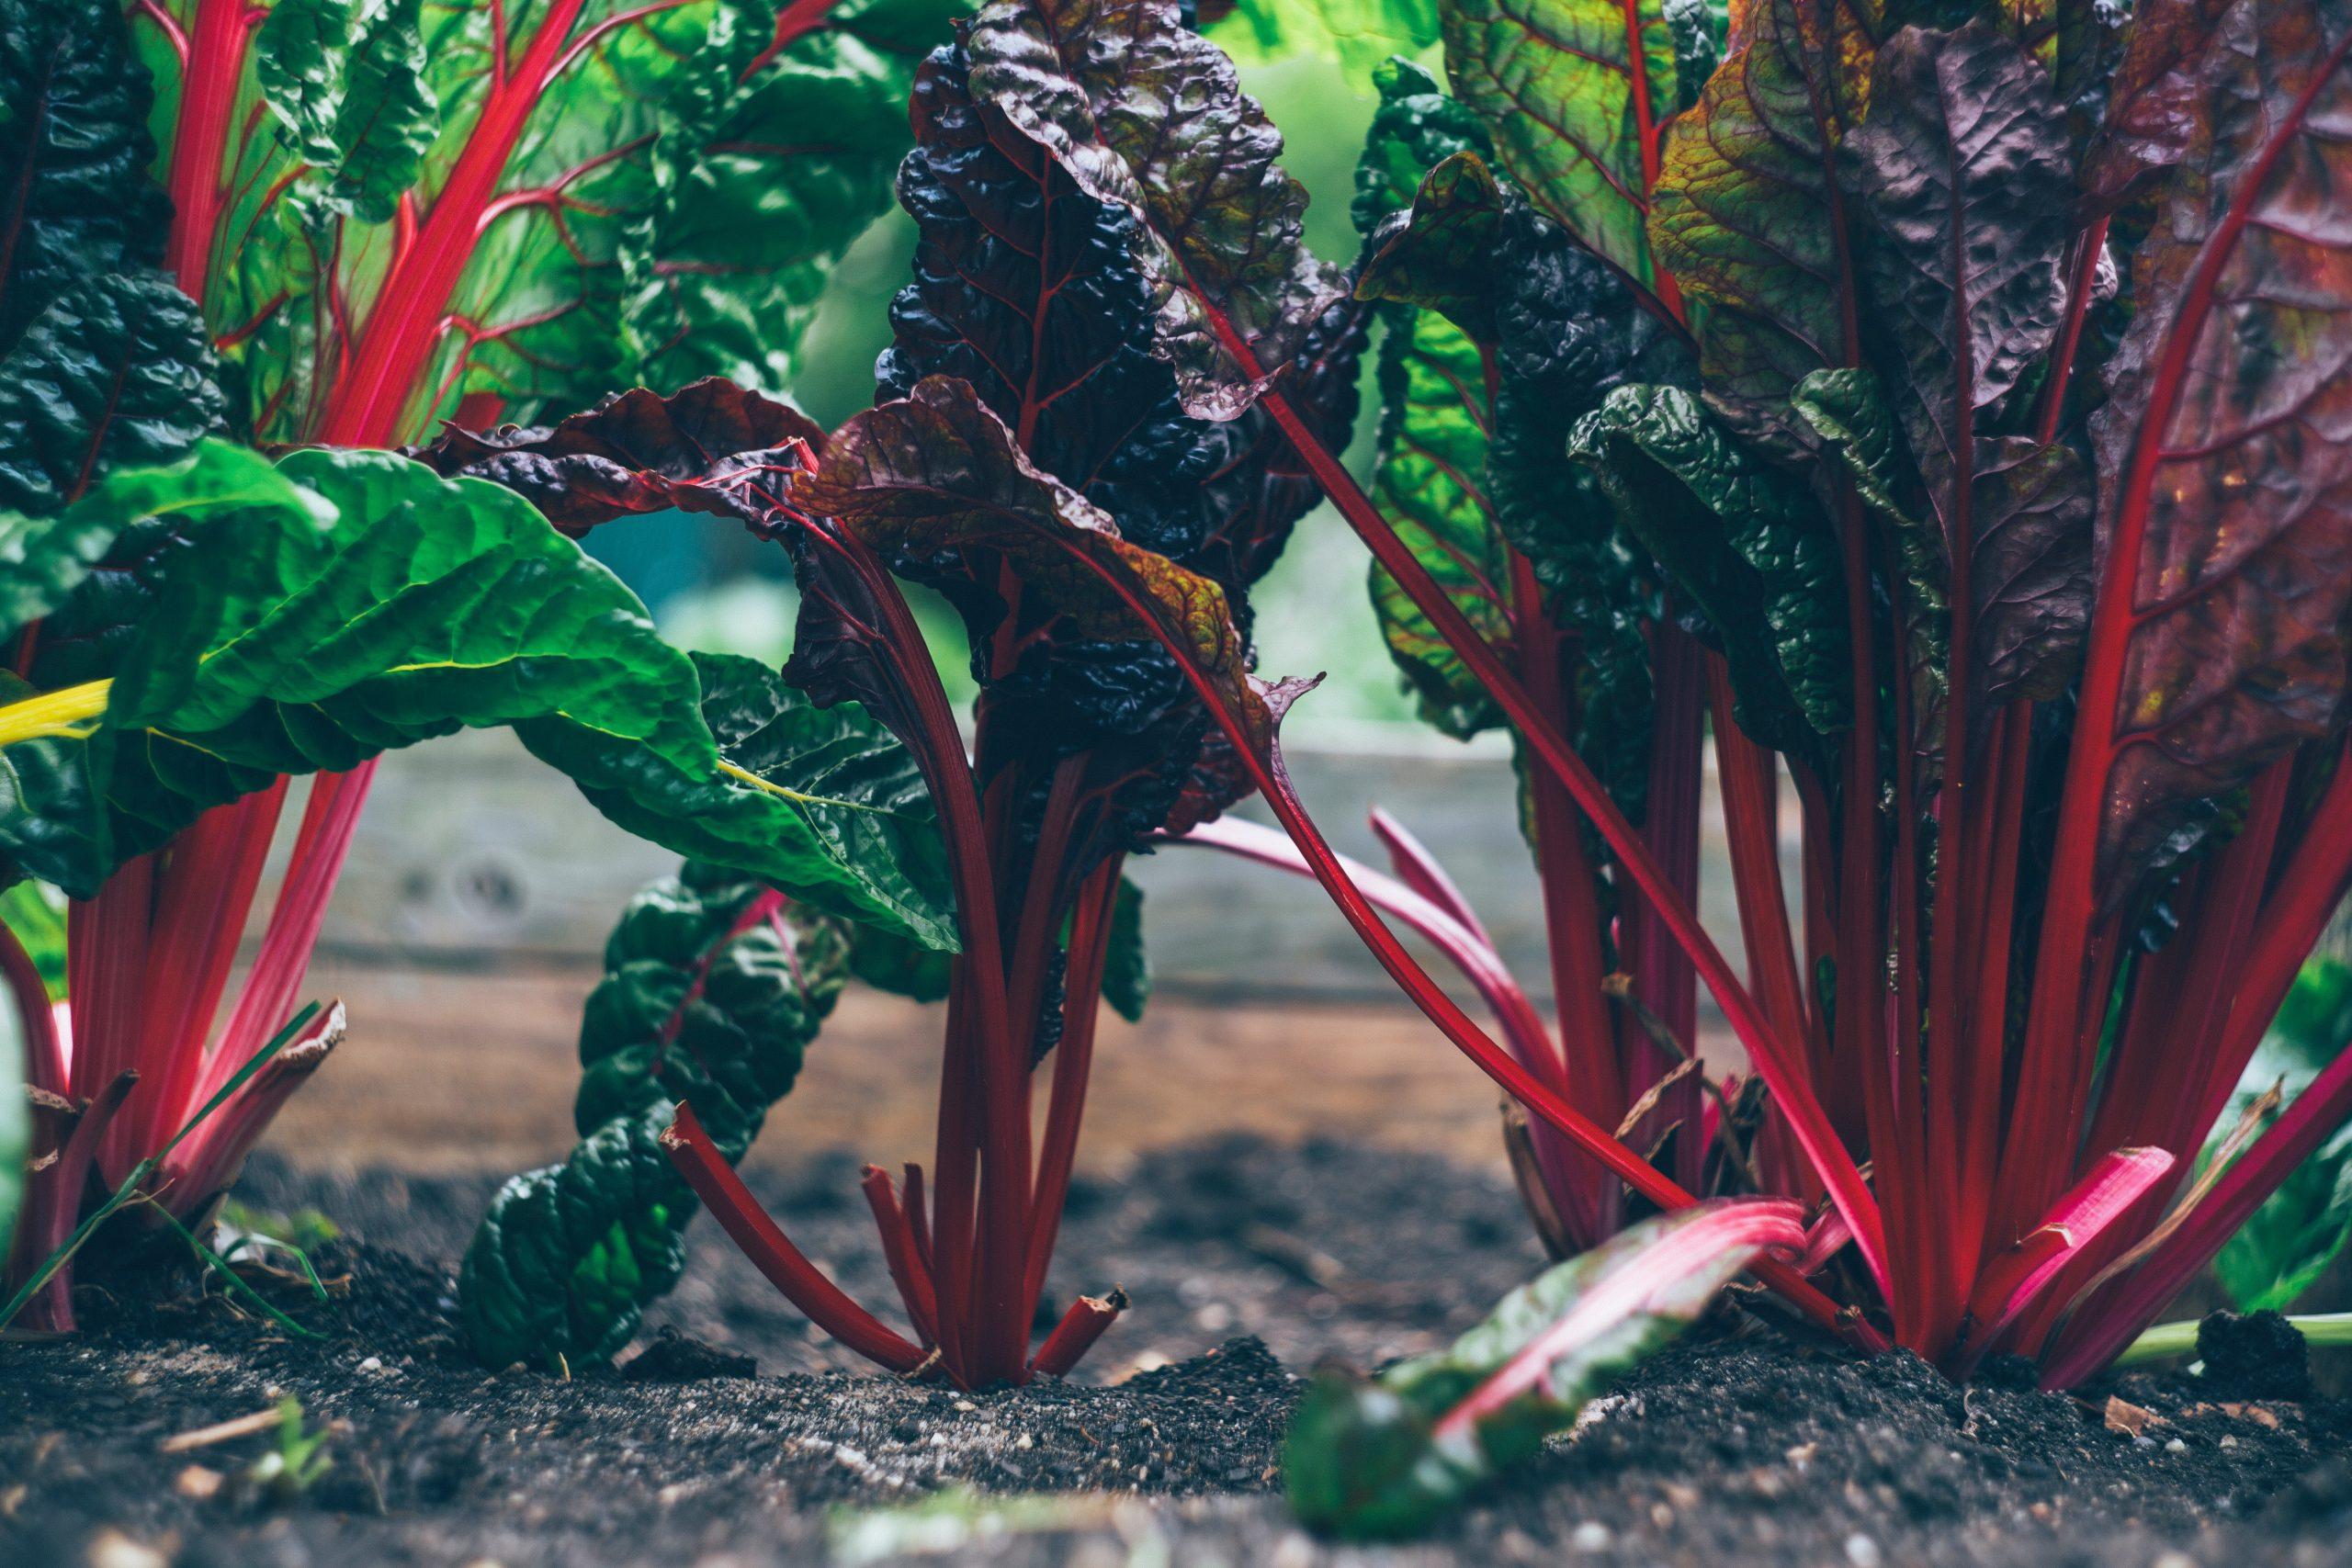 How to grow veggies in a tiny garden